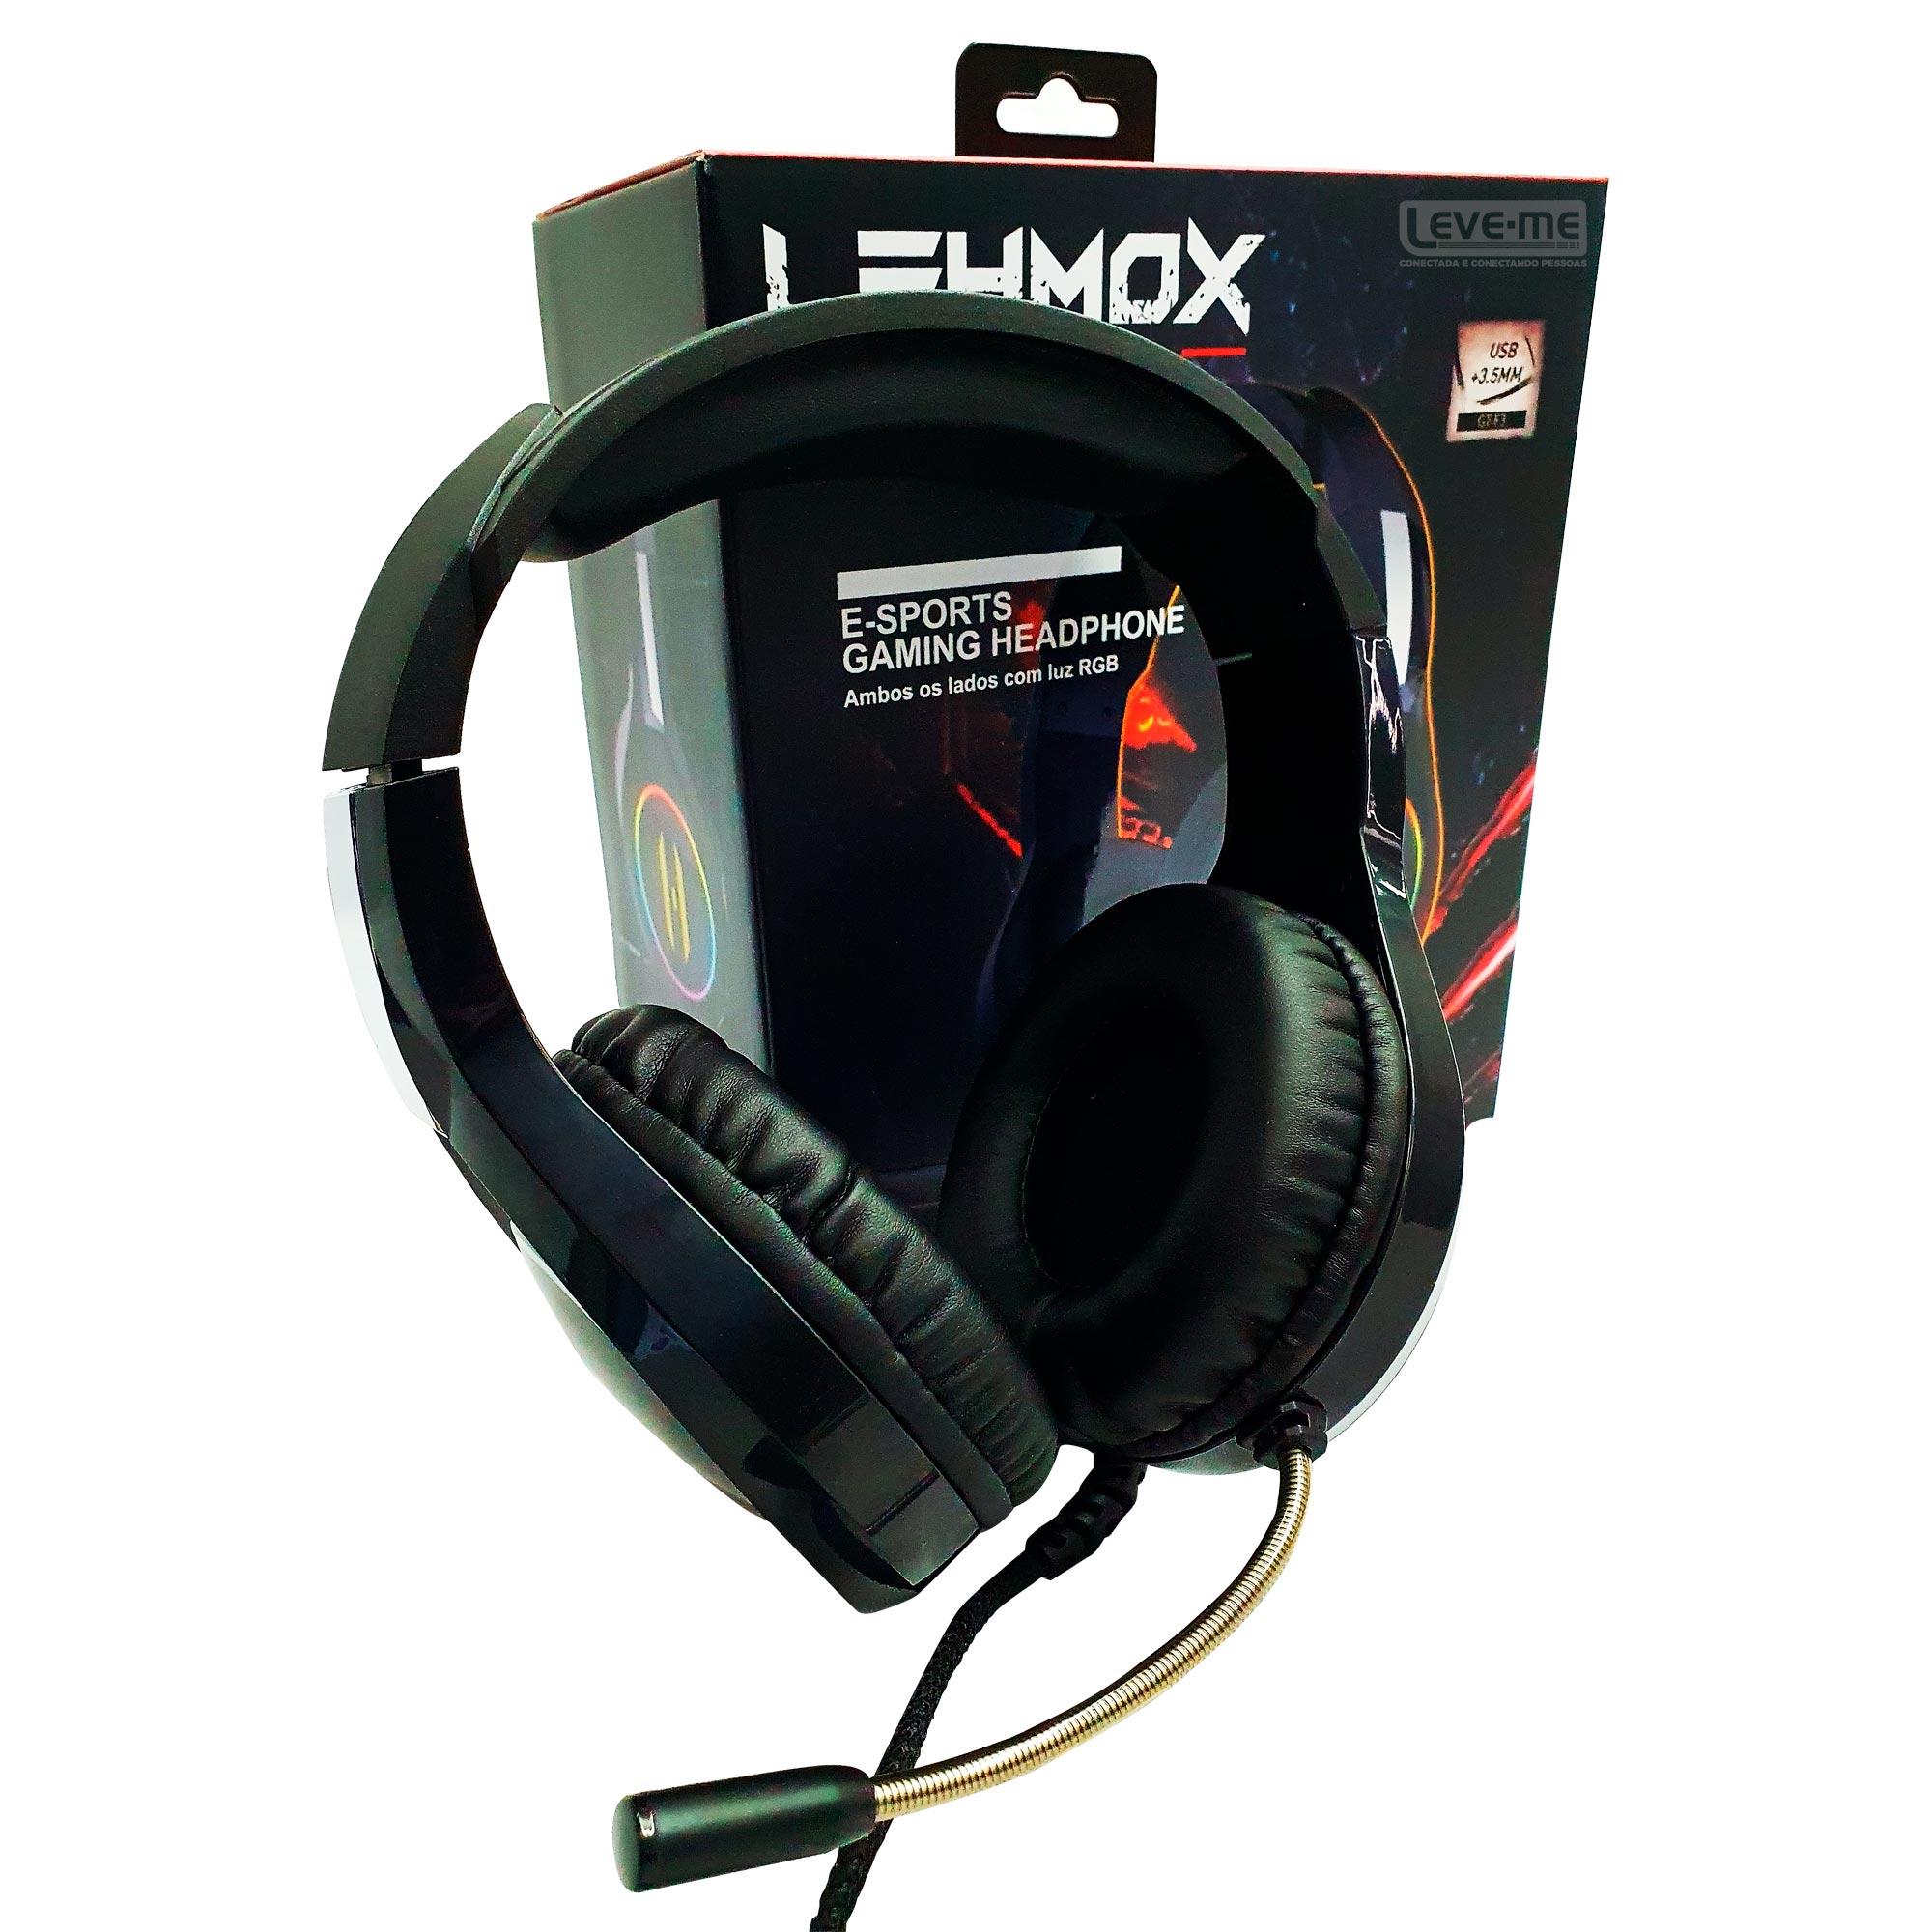 Headphone E-Sports Gaming - GT-F3